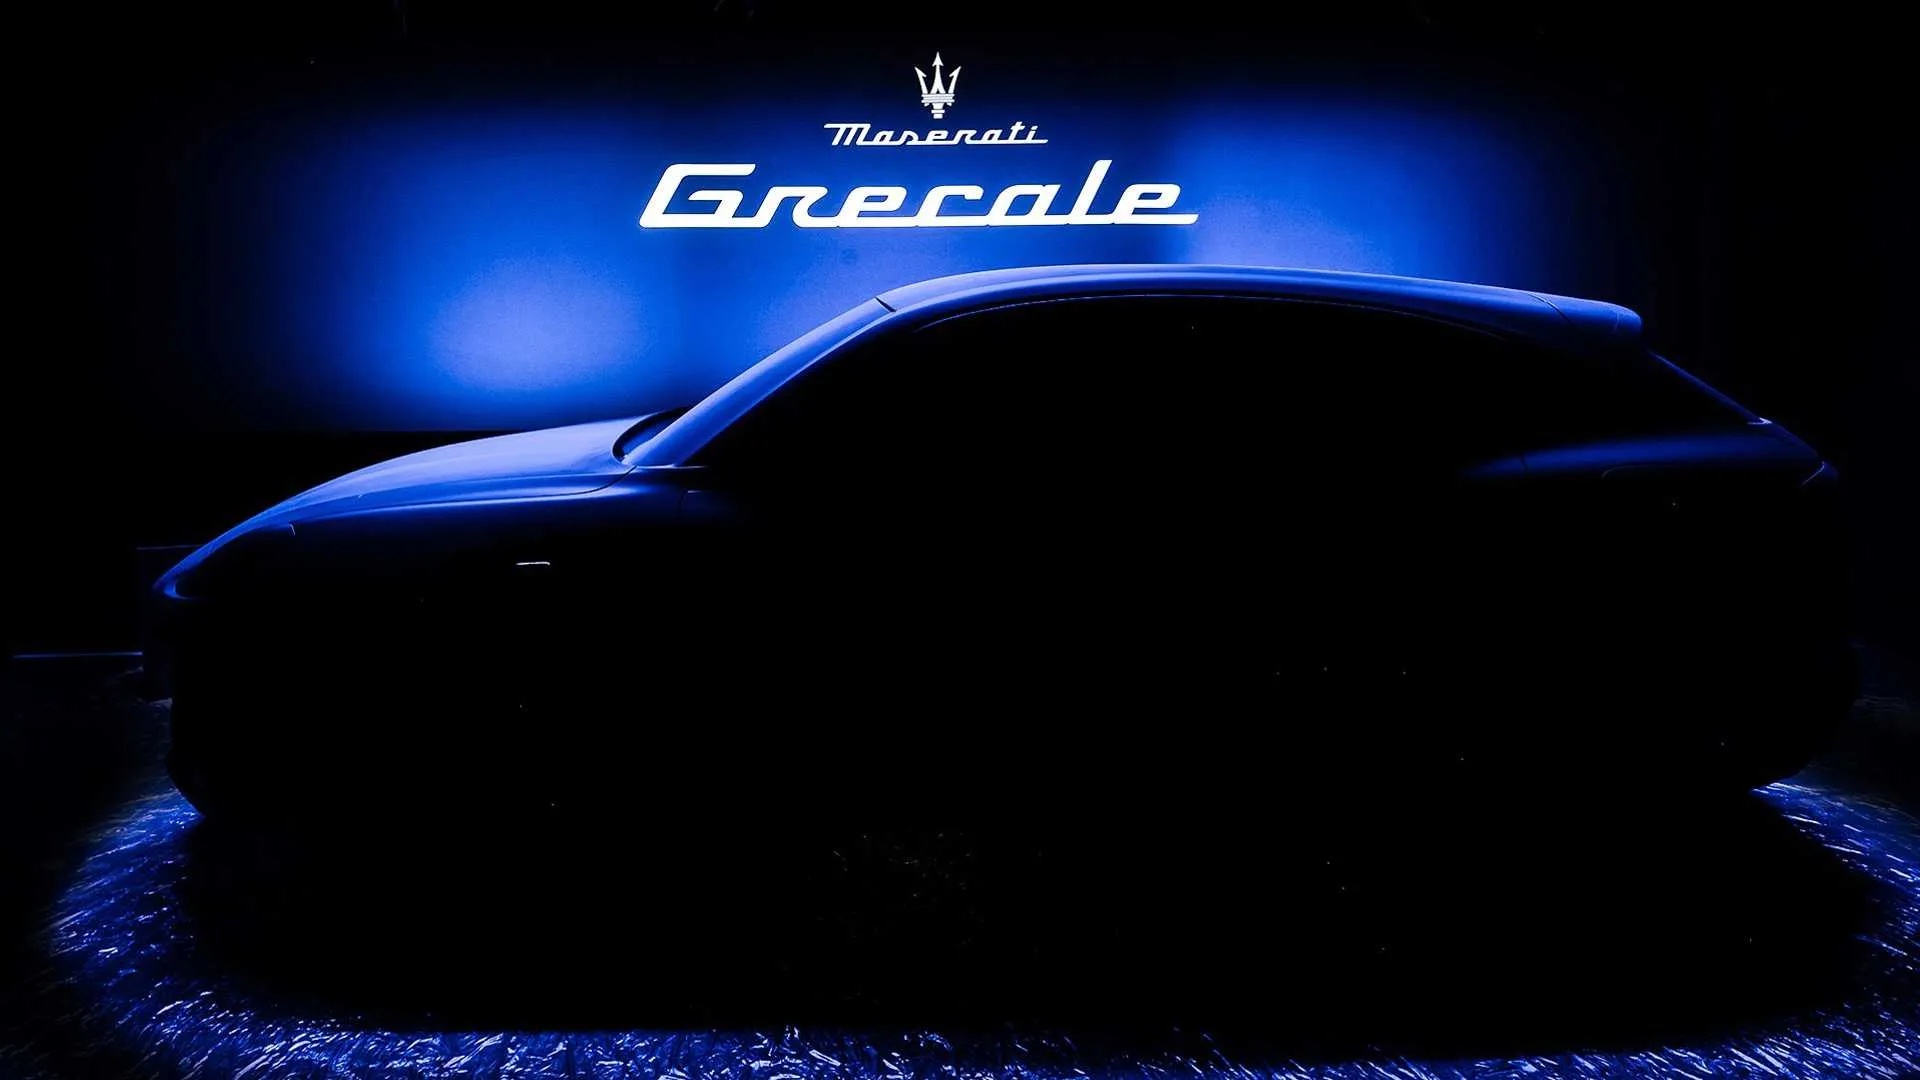 Maserati-Grecale-chiec-suv-hoan-toan-moi-du-kien-ra-mat-thang-11-anh-3.jpg